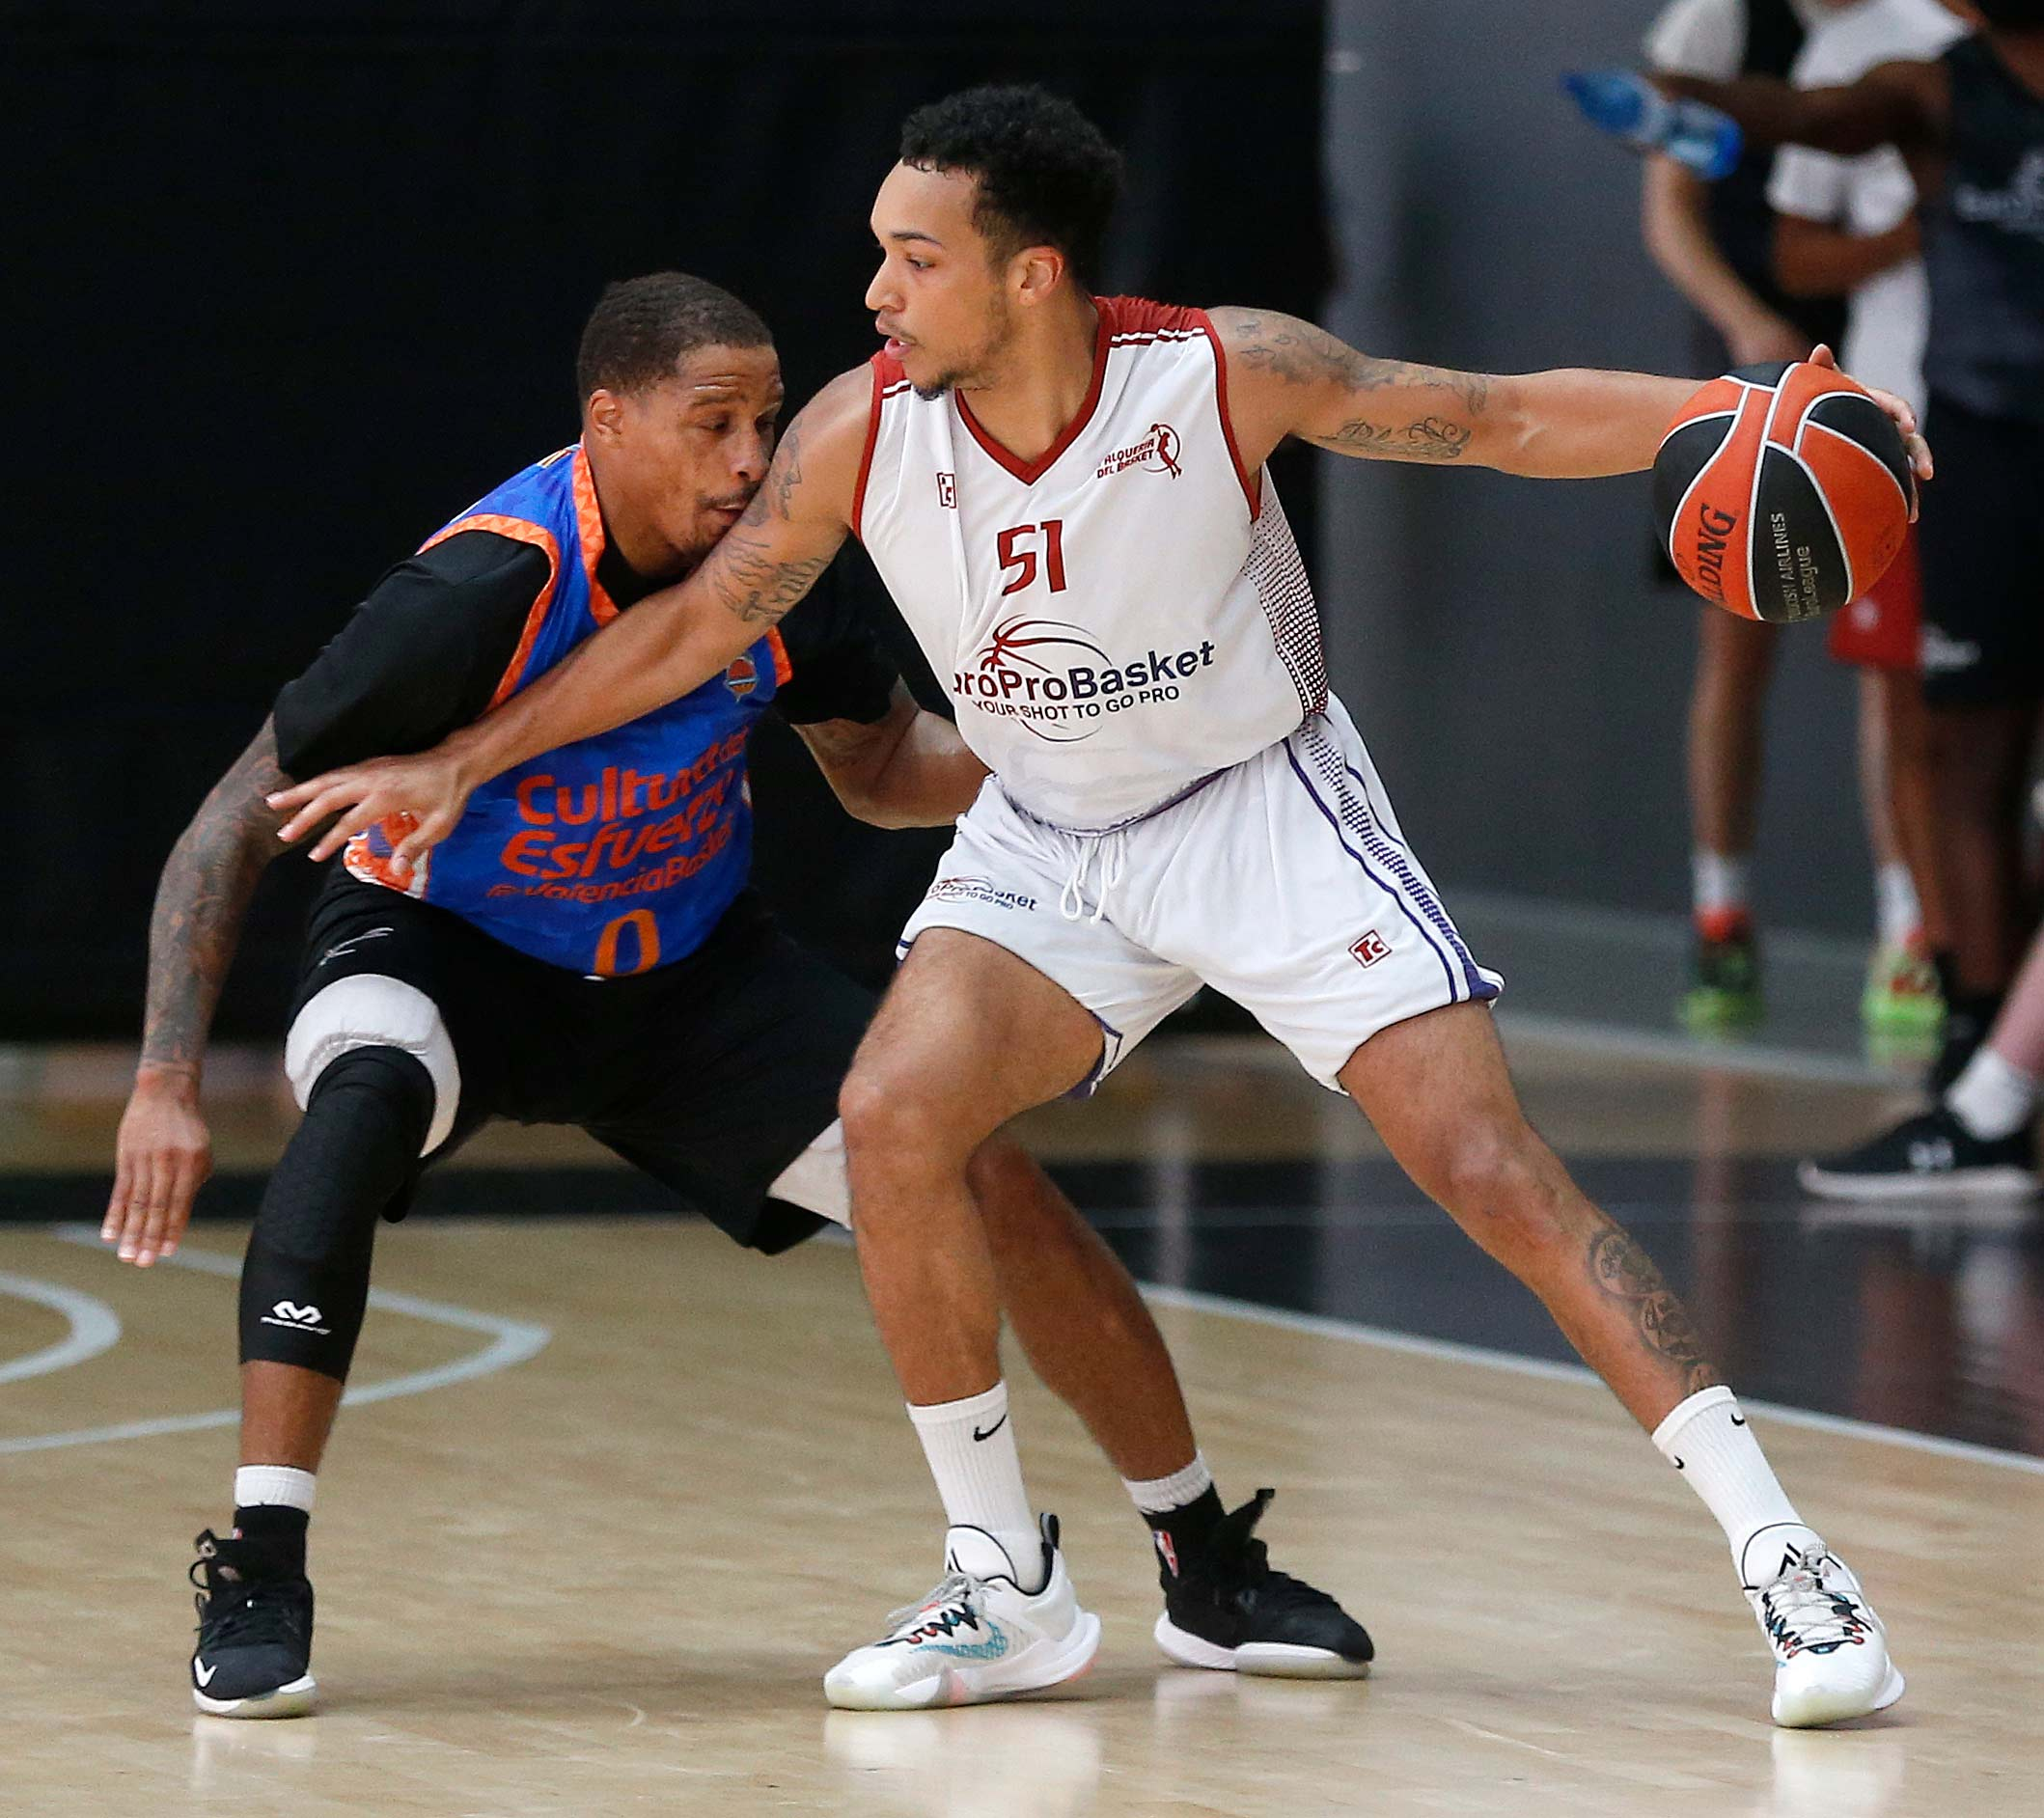 D'Ondre Stockman Basketball Spain